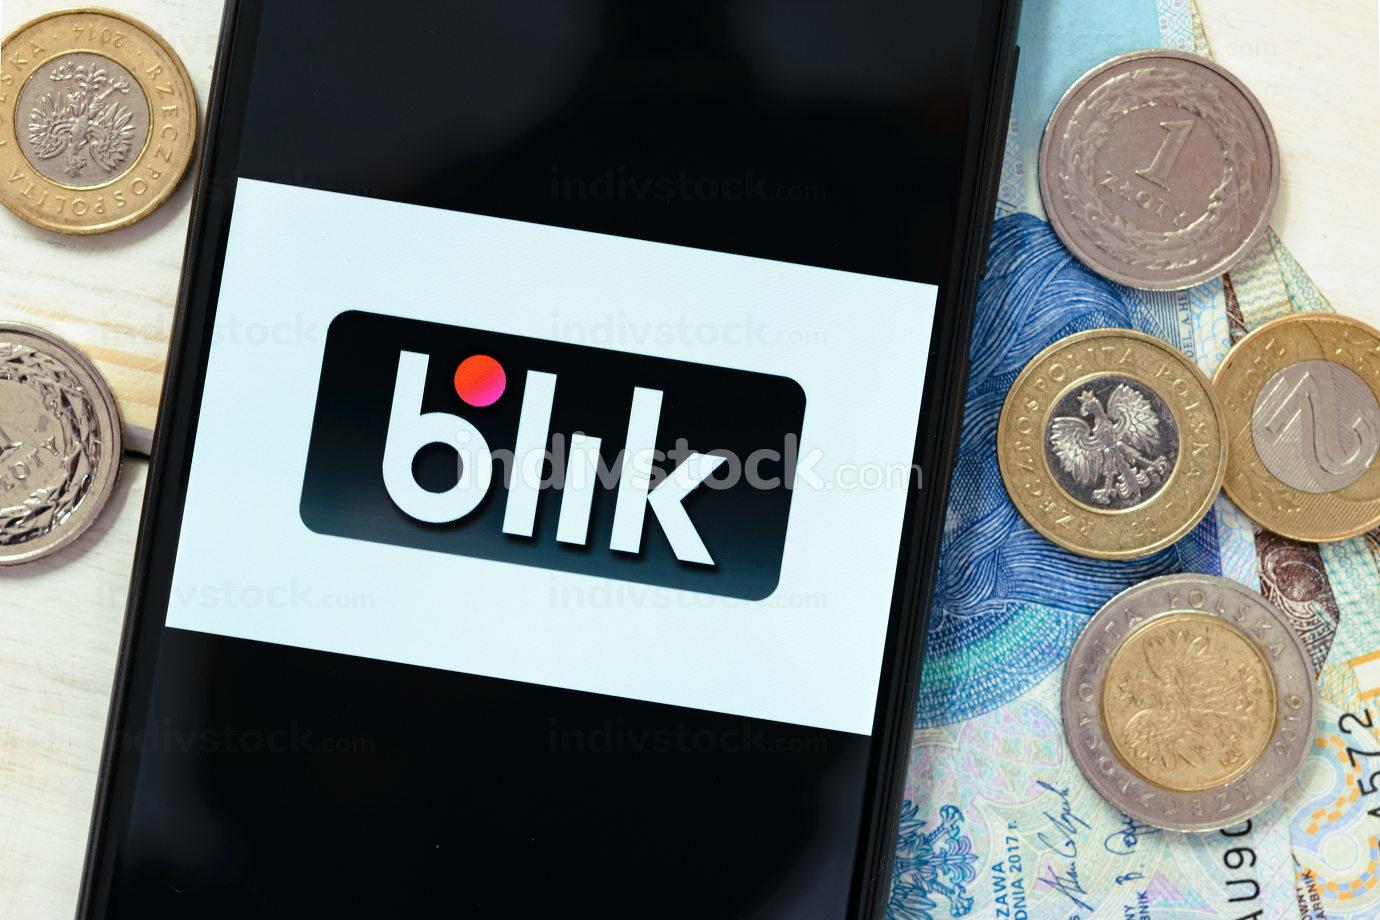 Krakow, Poland - October 20, 2020:  Blik sign on the smartphone screen